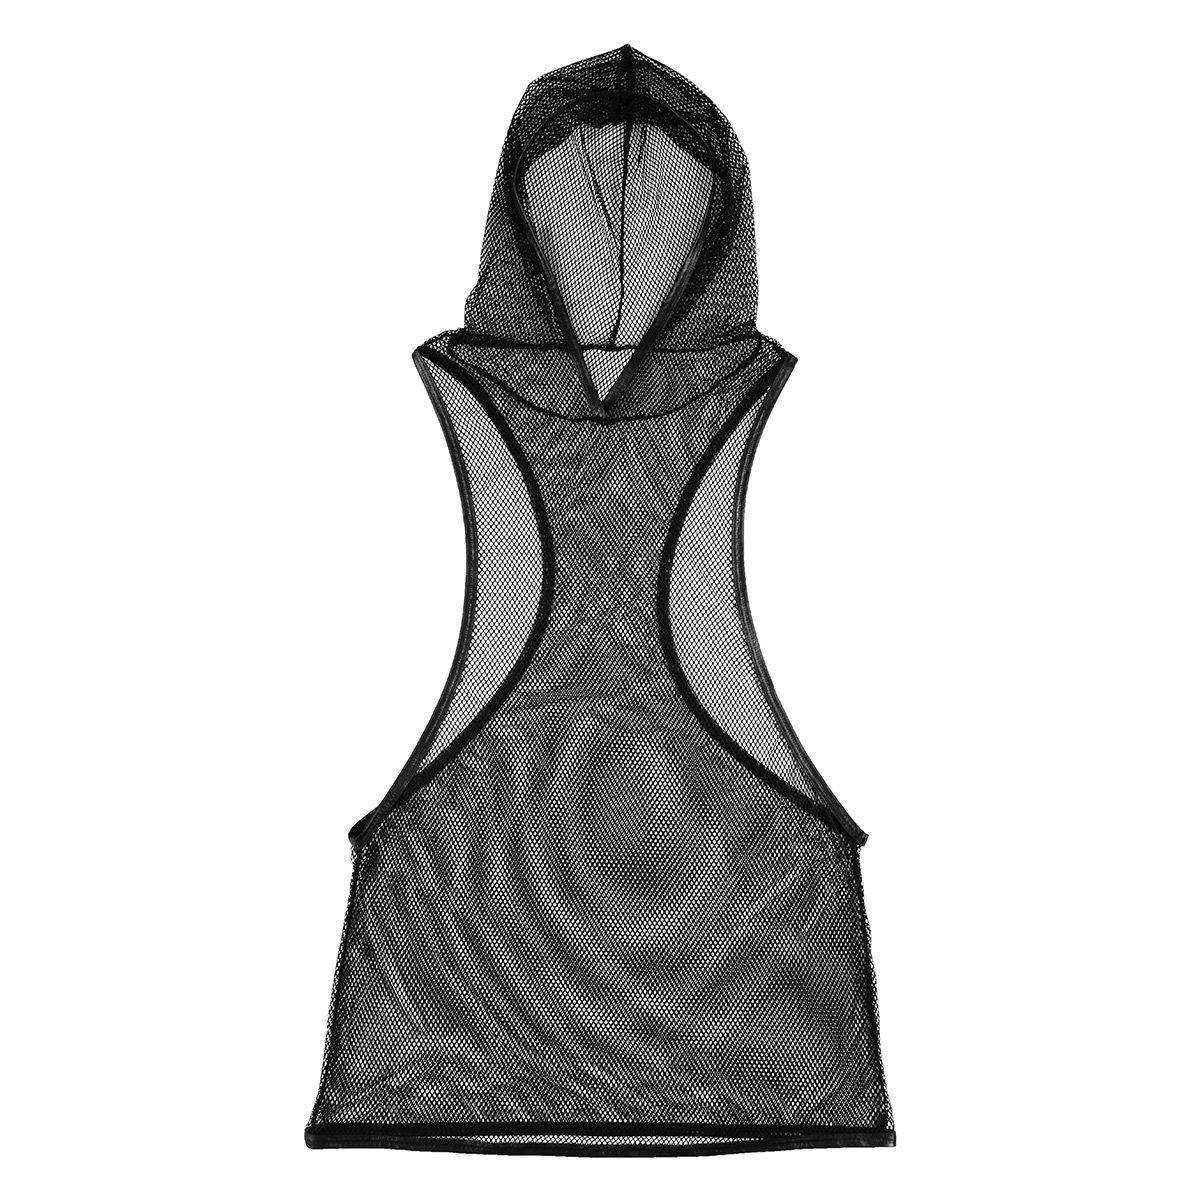 Freebily Men Mesh Underwear Fishnet Hoodie Tank Tops Vest Club Wear Undershirt